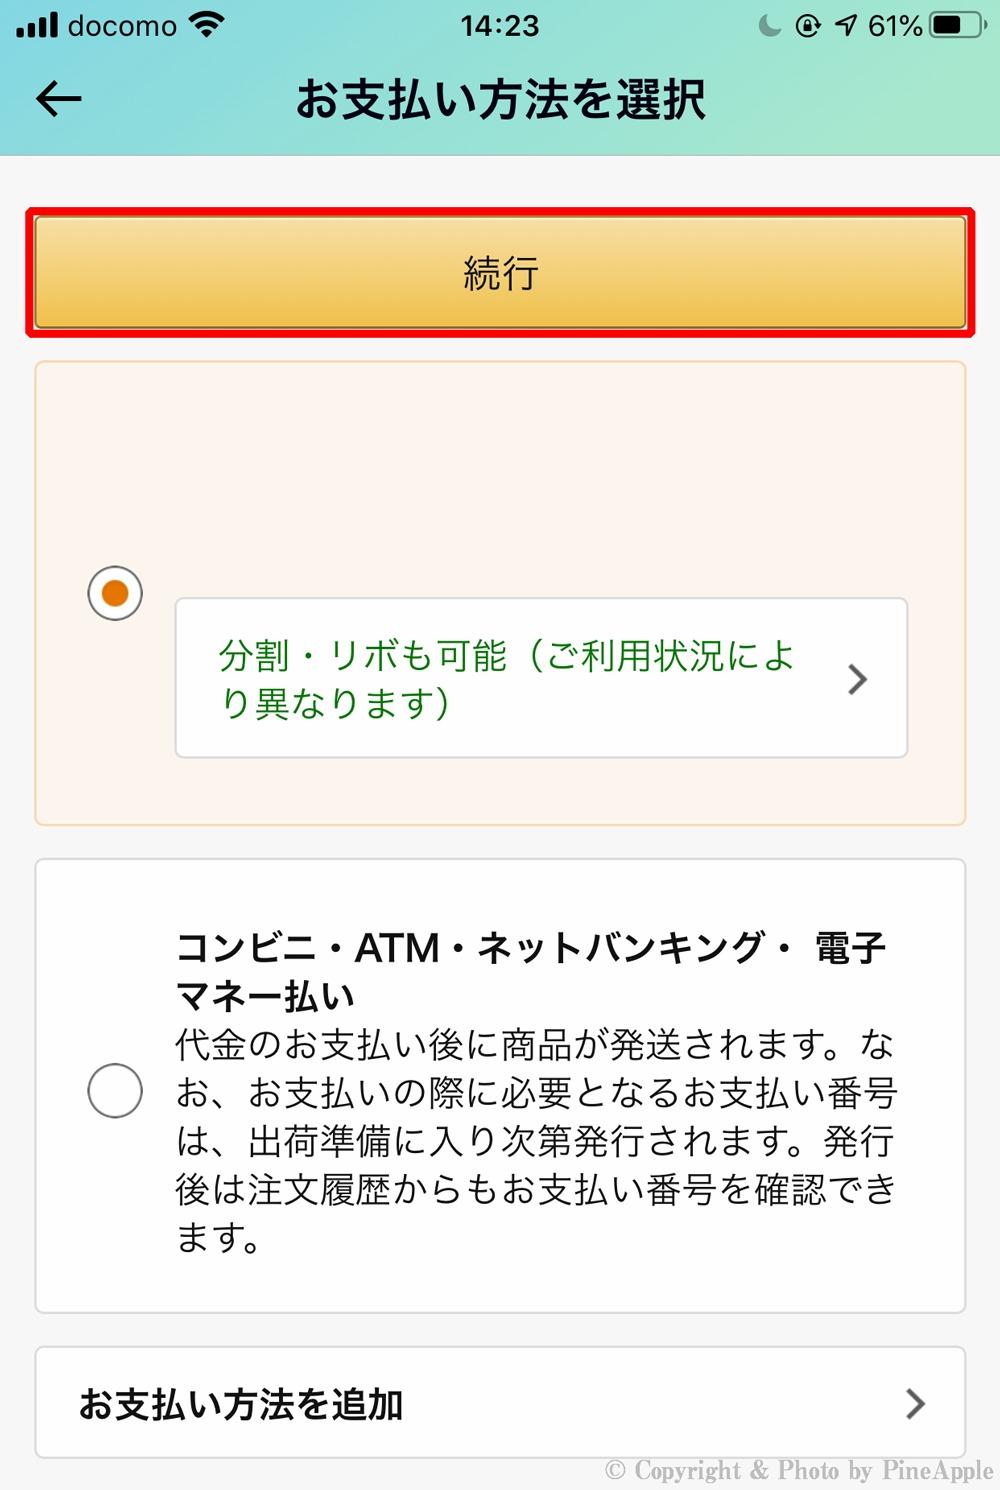 Amazon ショッピングアプリ:「お支払い方法を選択」画面から支払い方法を選択し、「続行」をタップ